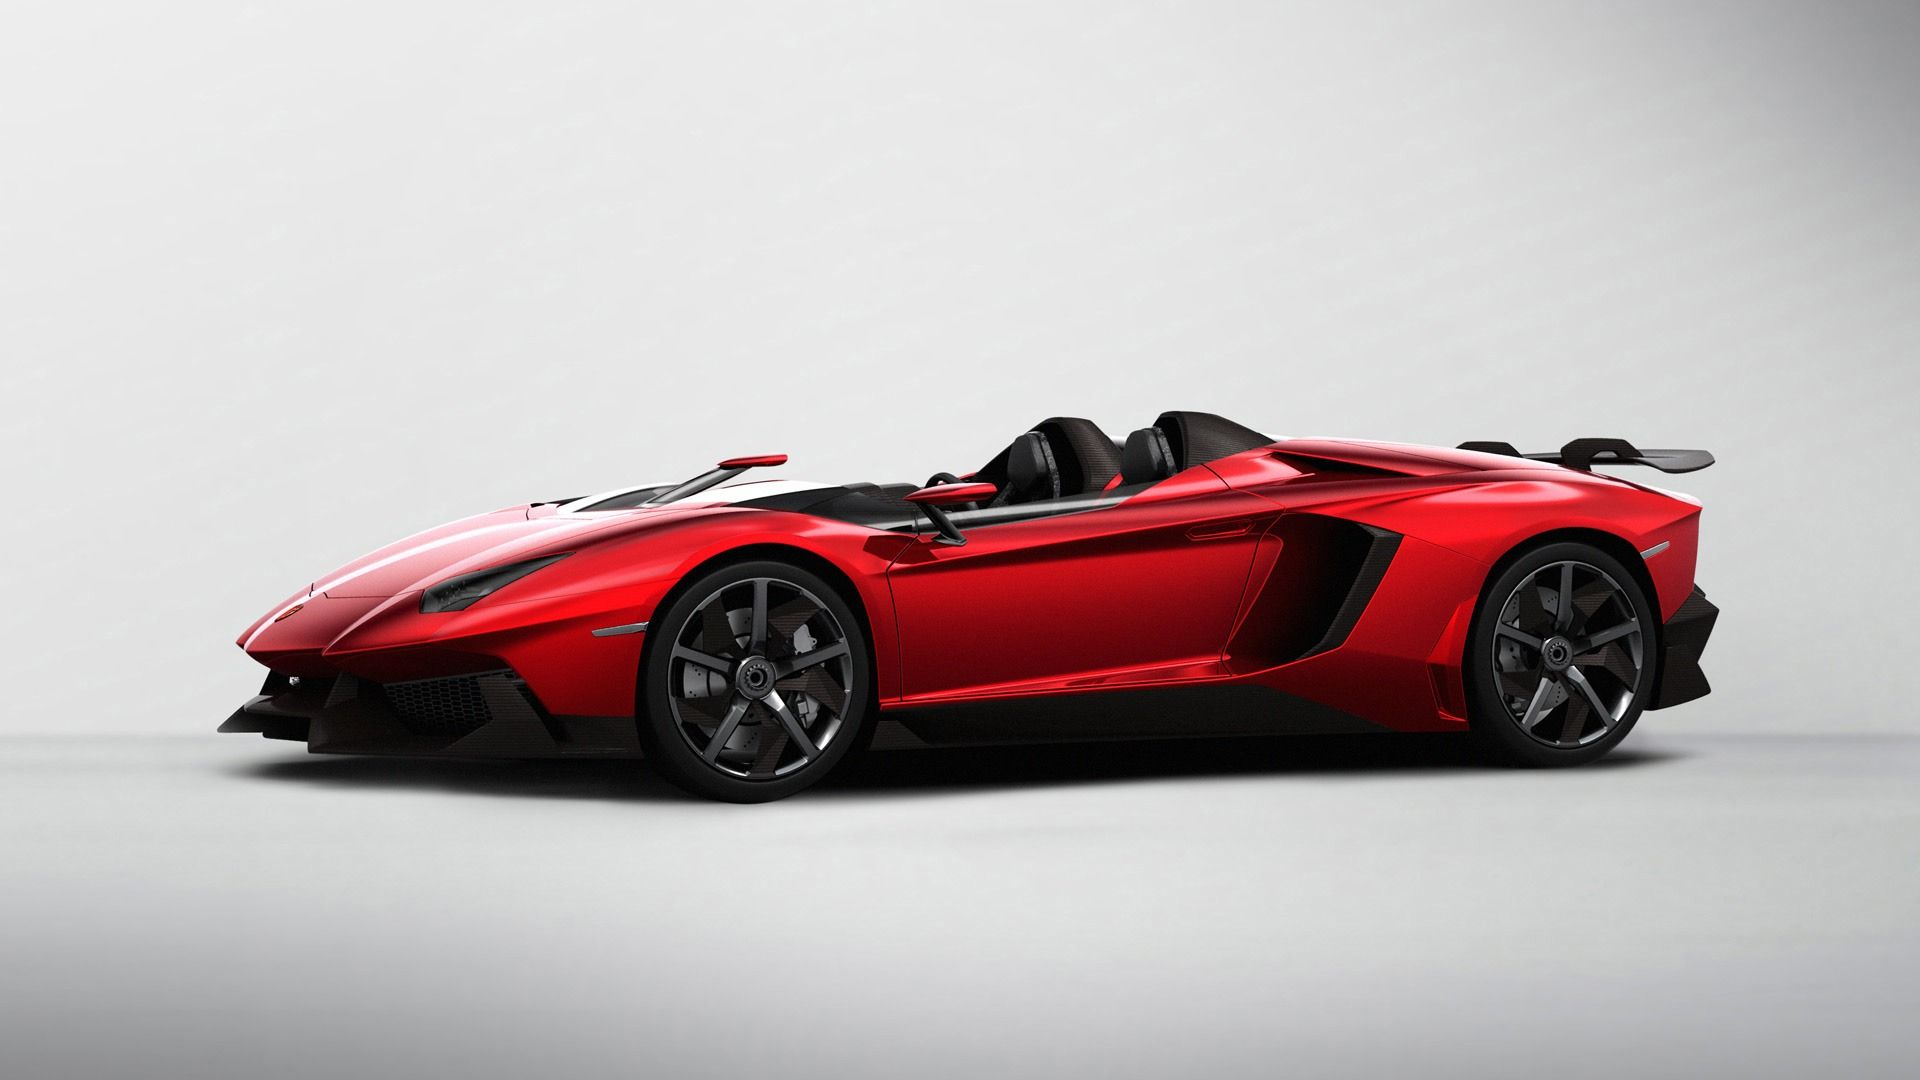 Ordinaire Lamborghini Aventador J HD Wallpapers 1080p | WallpapersCharlie